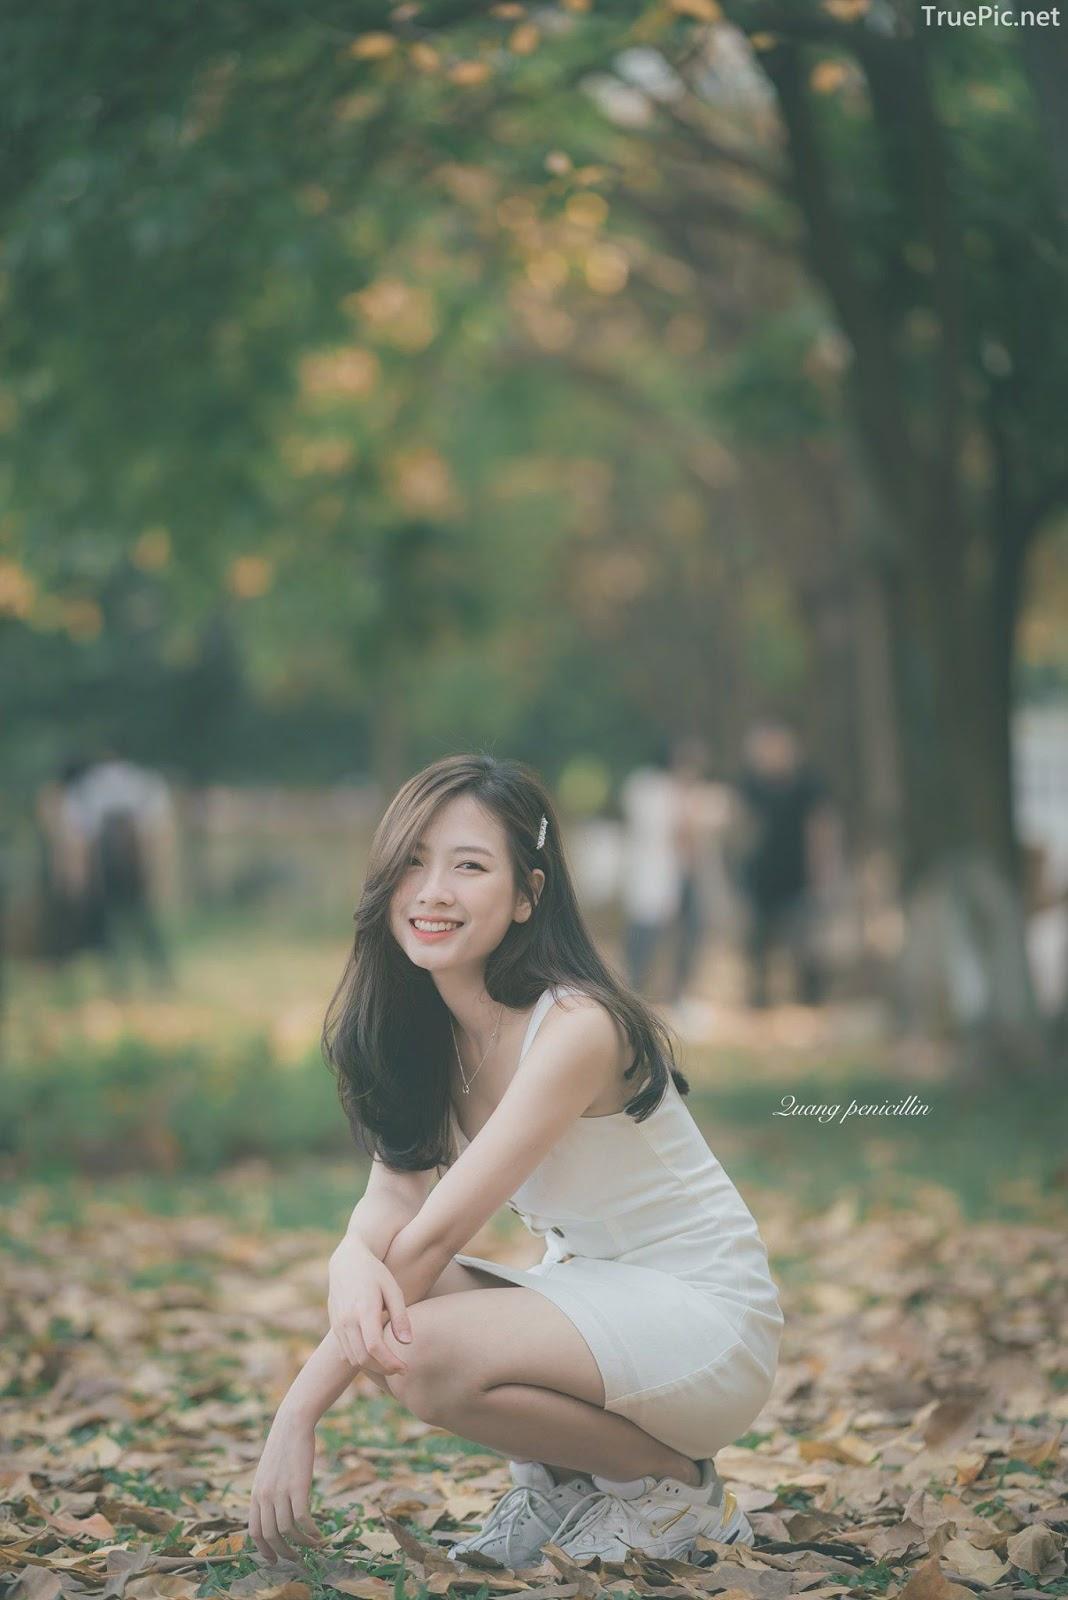 Vietnamese Hot Girl Linh Hoai - Season of falling leaves - TruePic.net - Picture 7